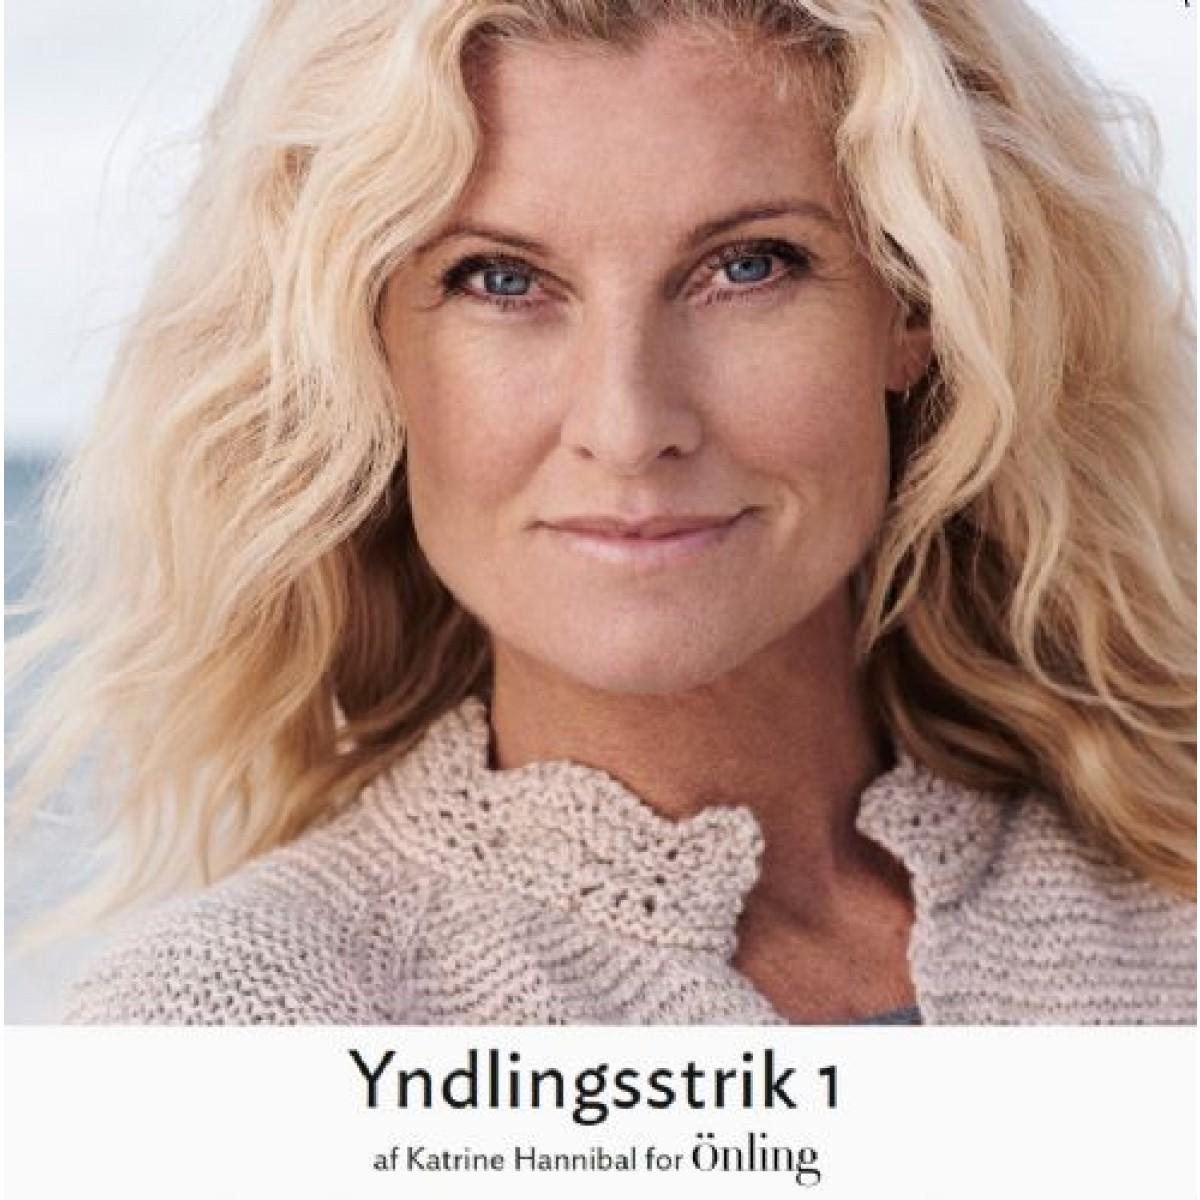 Yndlingsstrik, Katrine Hannibal-31